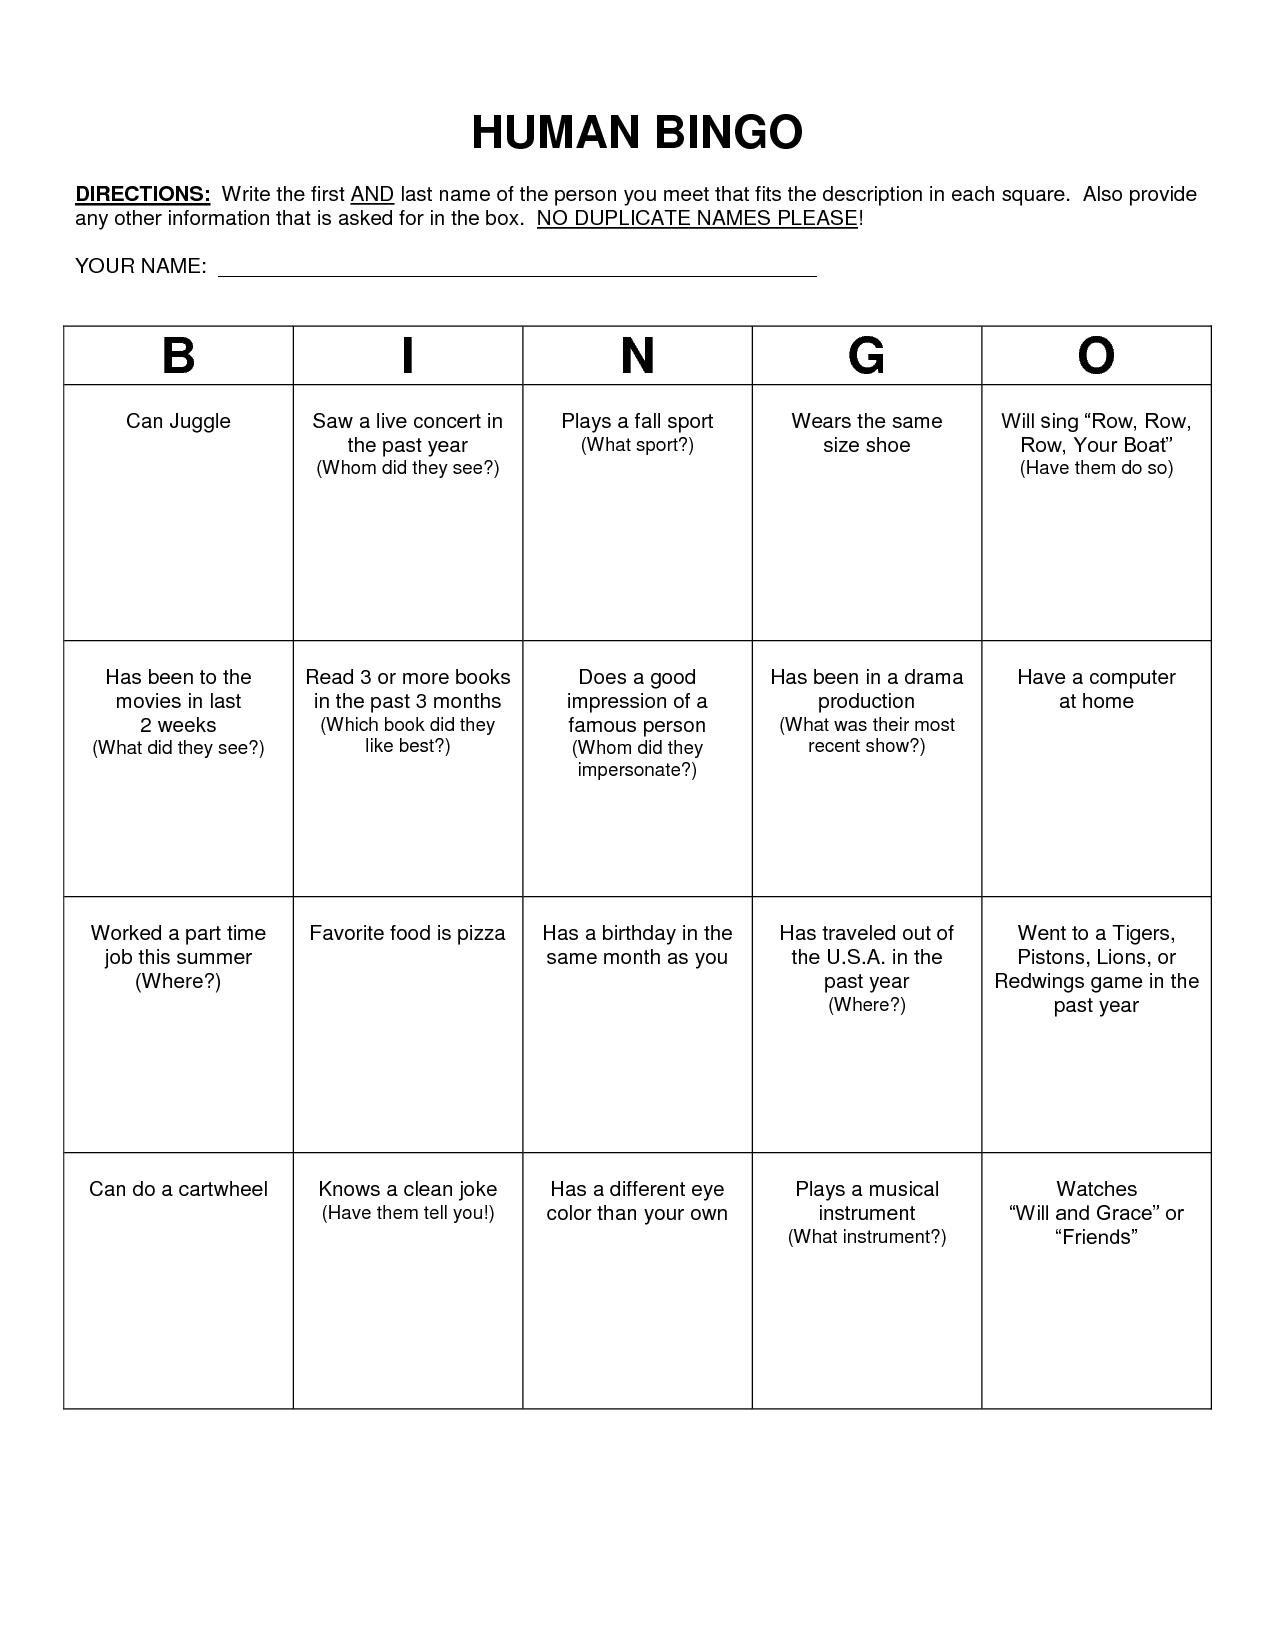 Human Bingo Scavenger Hunt Template  Classroom  Human Bingo Bingo For Ice Breaker Bingo Card Template